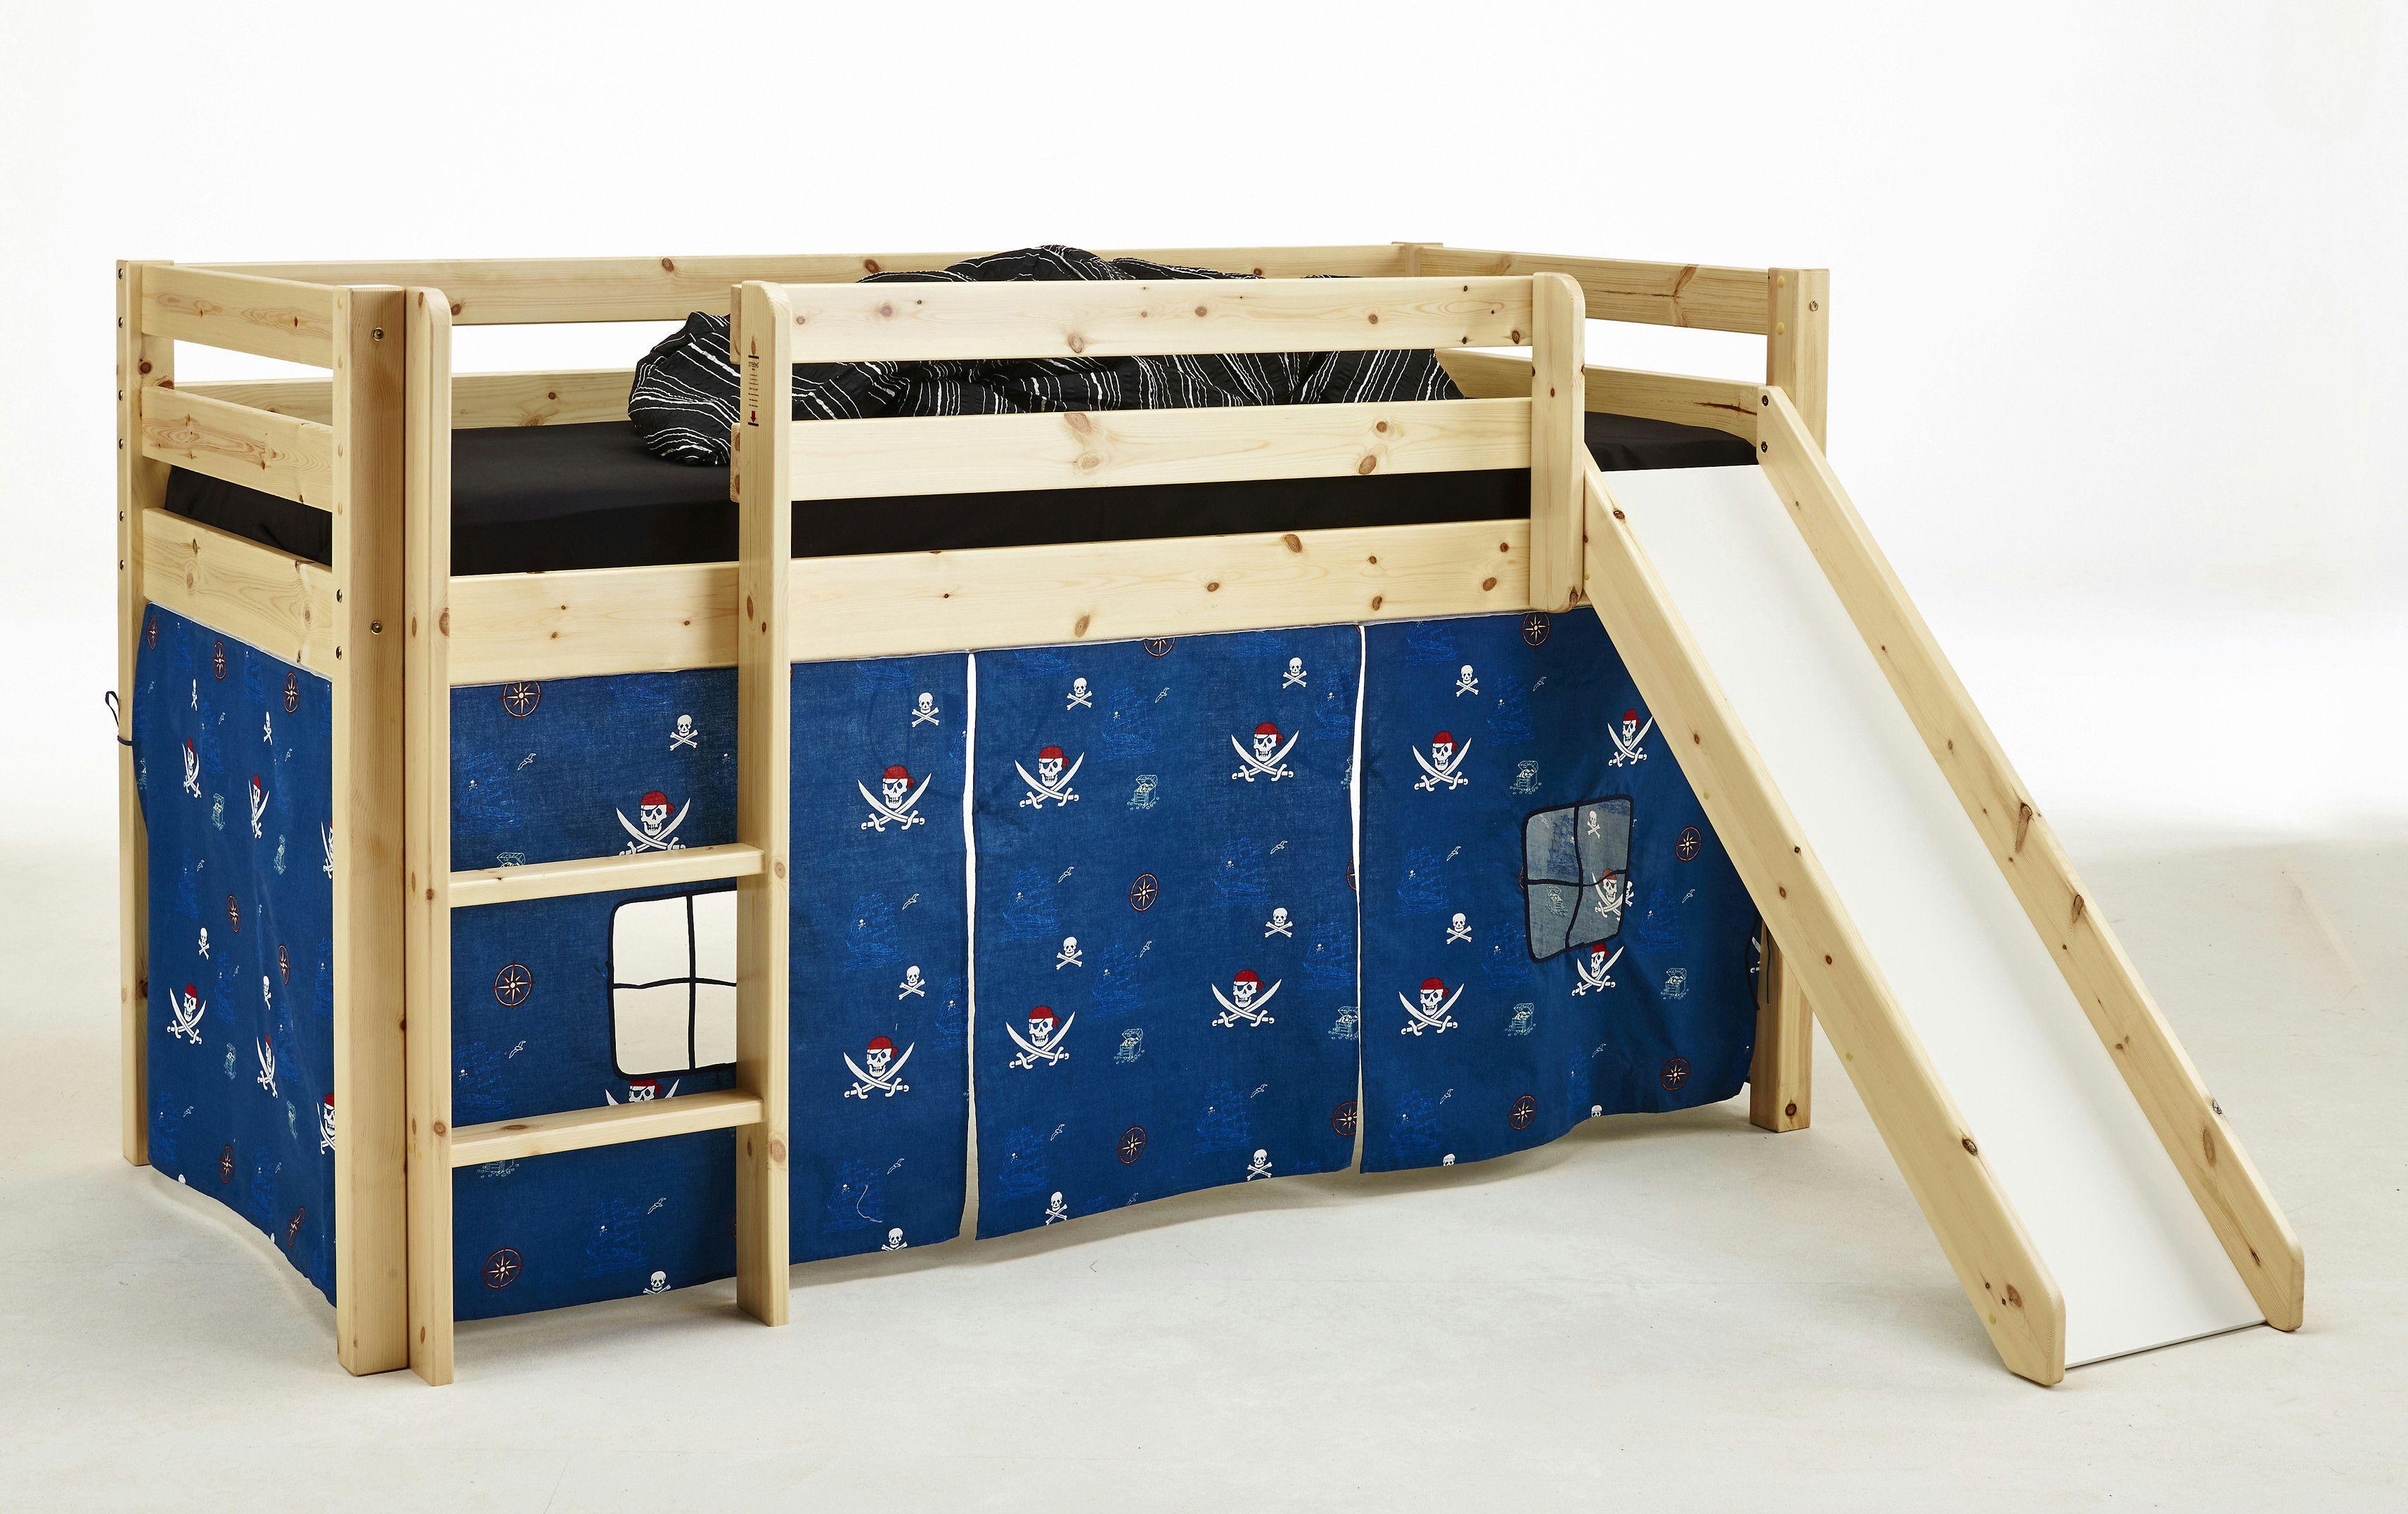 jerry halbhochbett ll m bel zeit. Black Bedroom Furniture Sets. Home Design Ideas